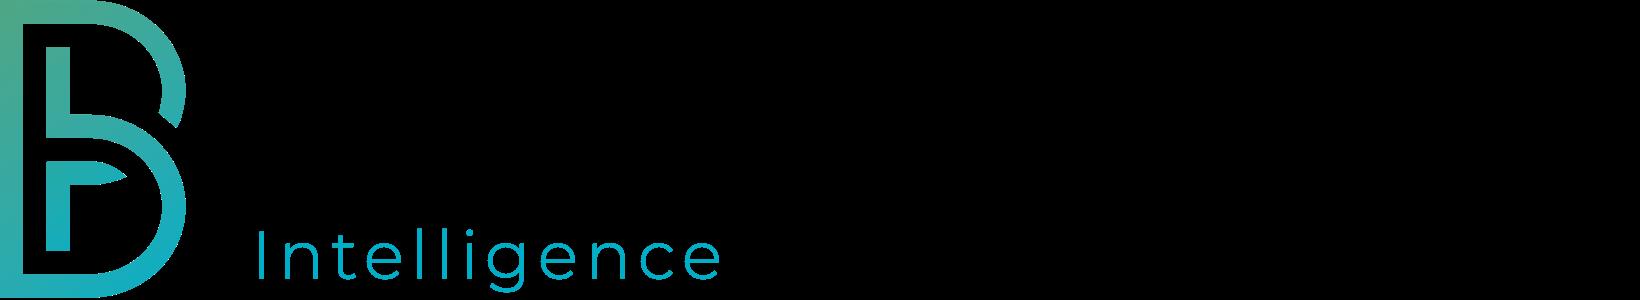 BEAN Partners — Intelligence